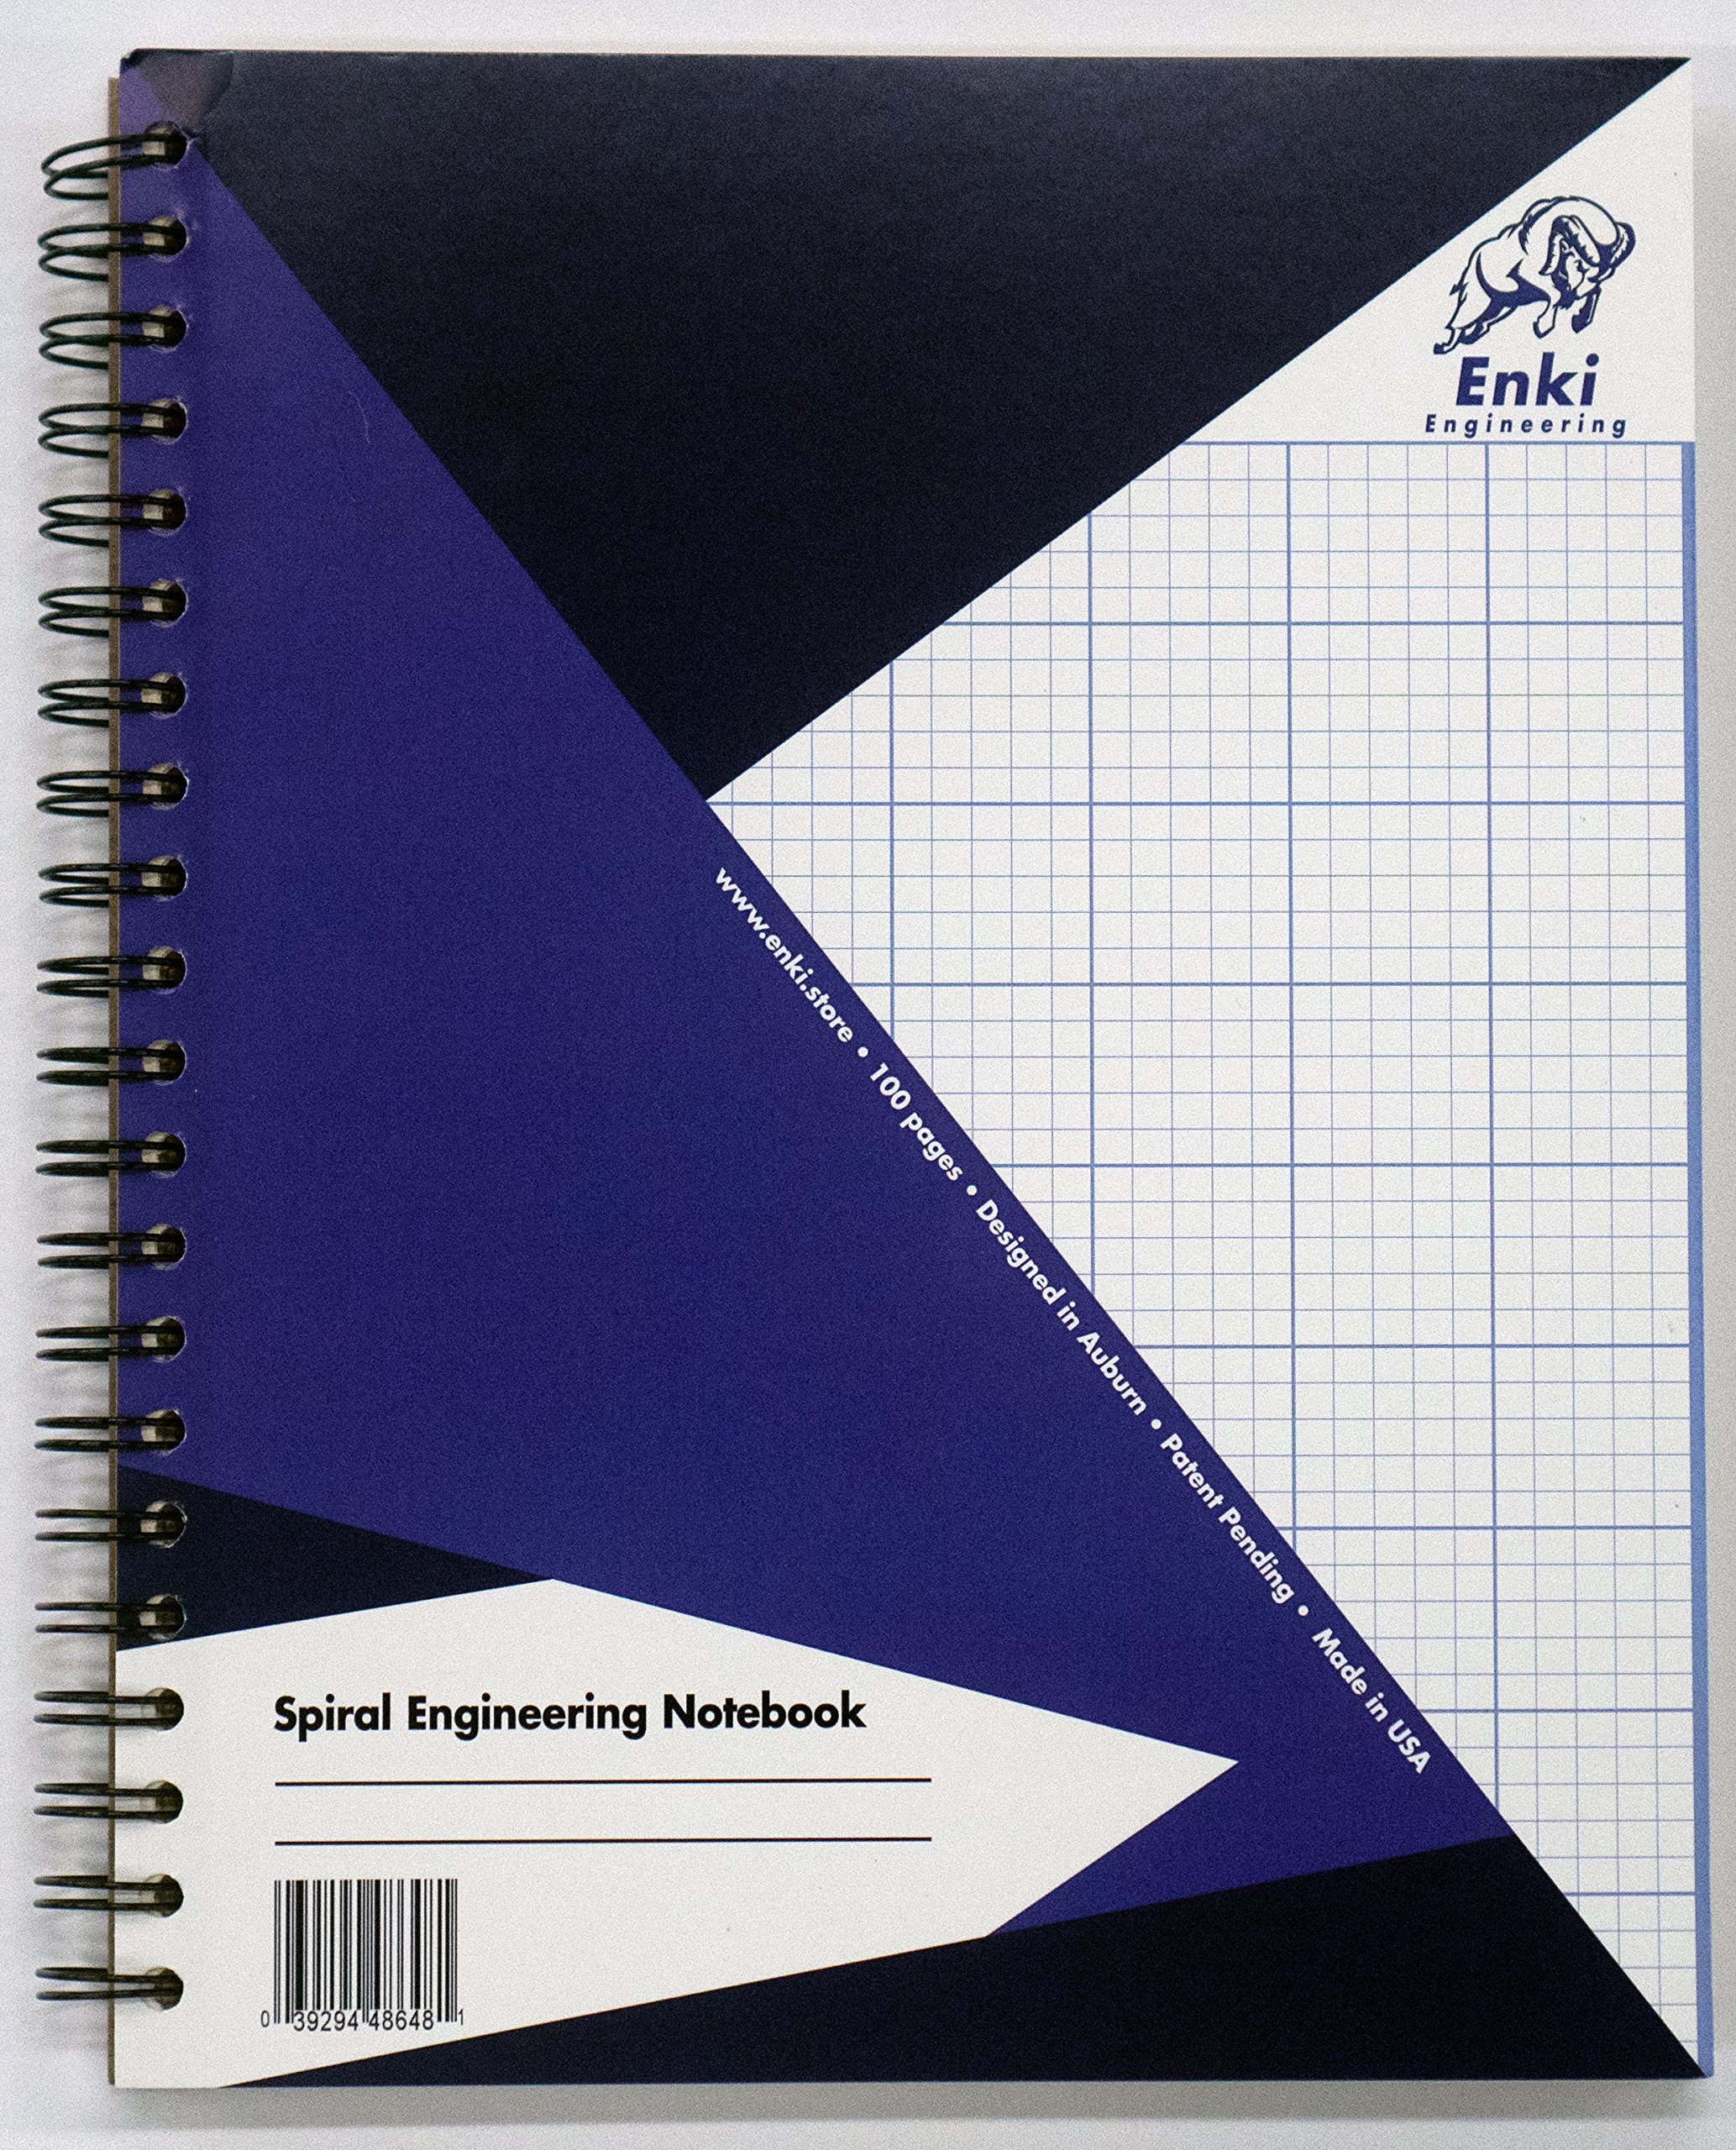 Engineering Paper 200 sheet - Spiral Notebook (Blue Cover) by Enki Engineering